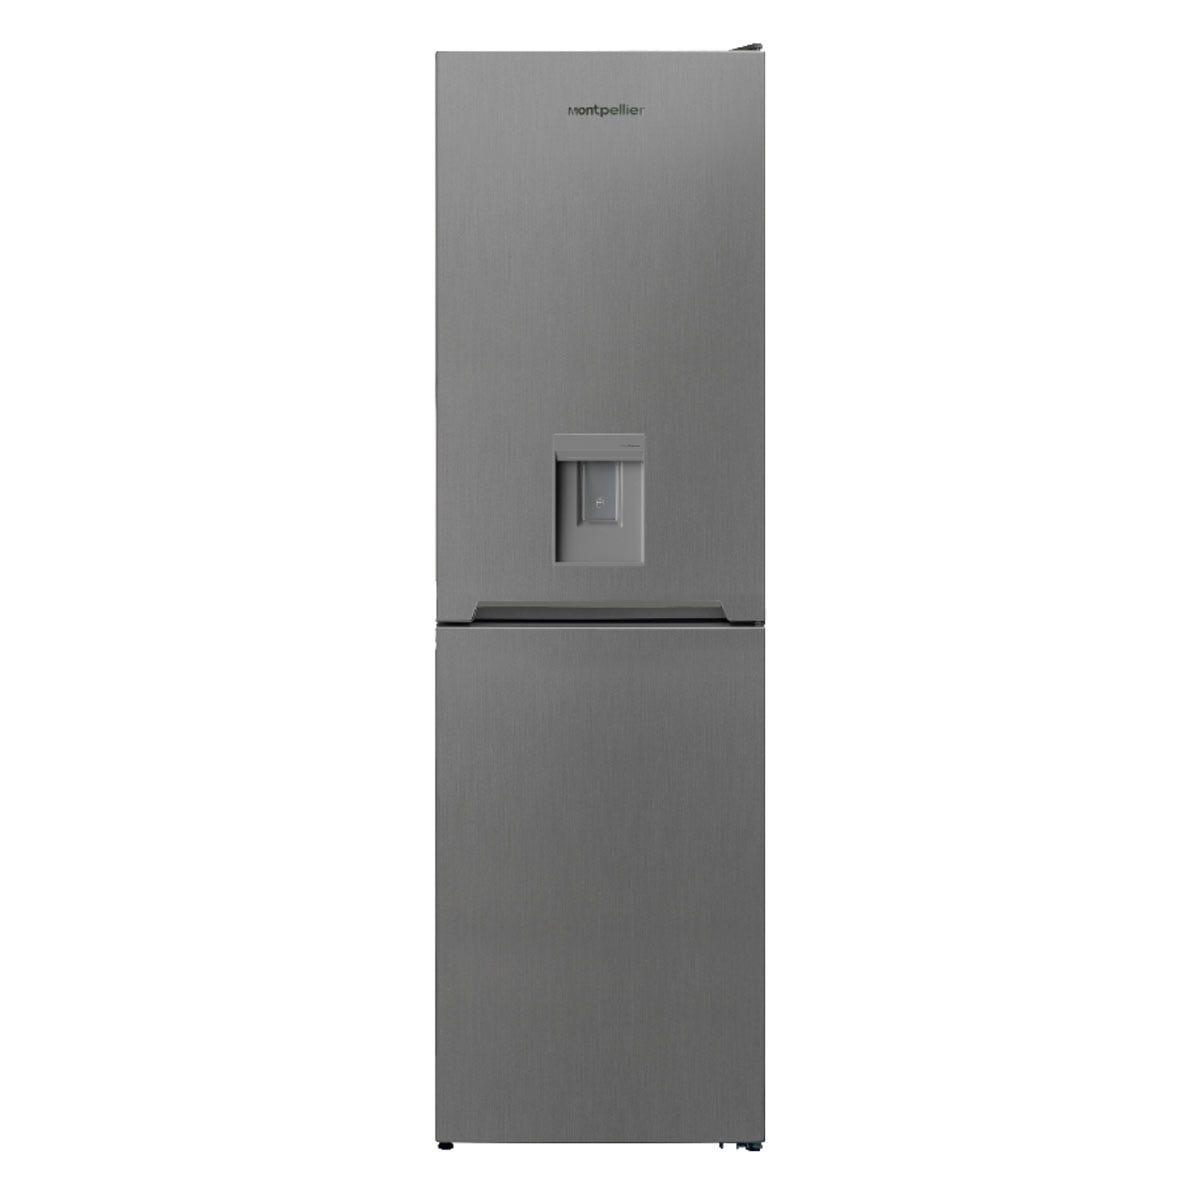 Montpellier MFF185DX 54cm 50/50 Frost Free Fridge Freezer with Drinks Dispenser - Inox